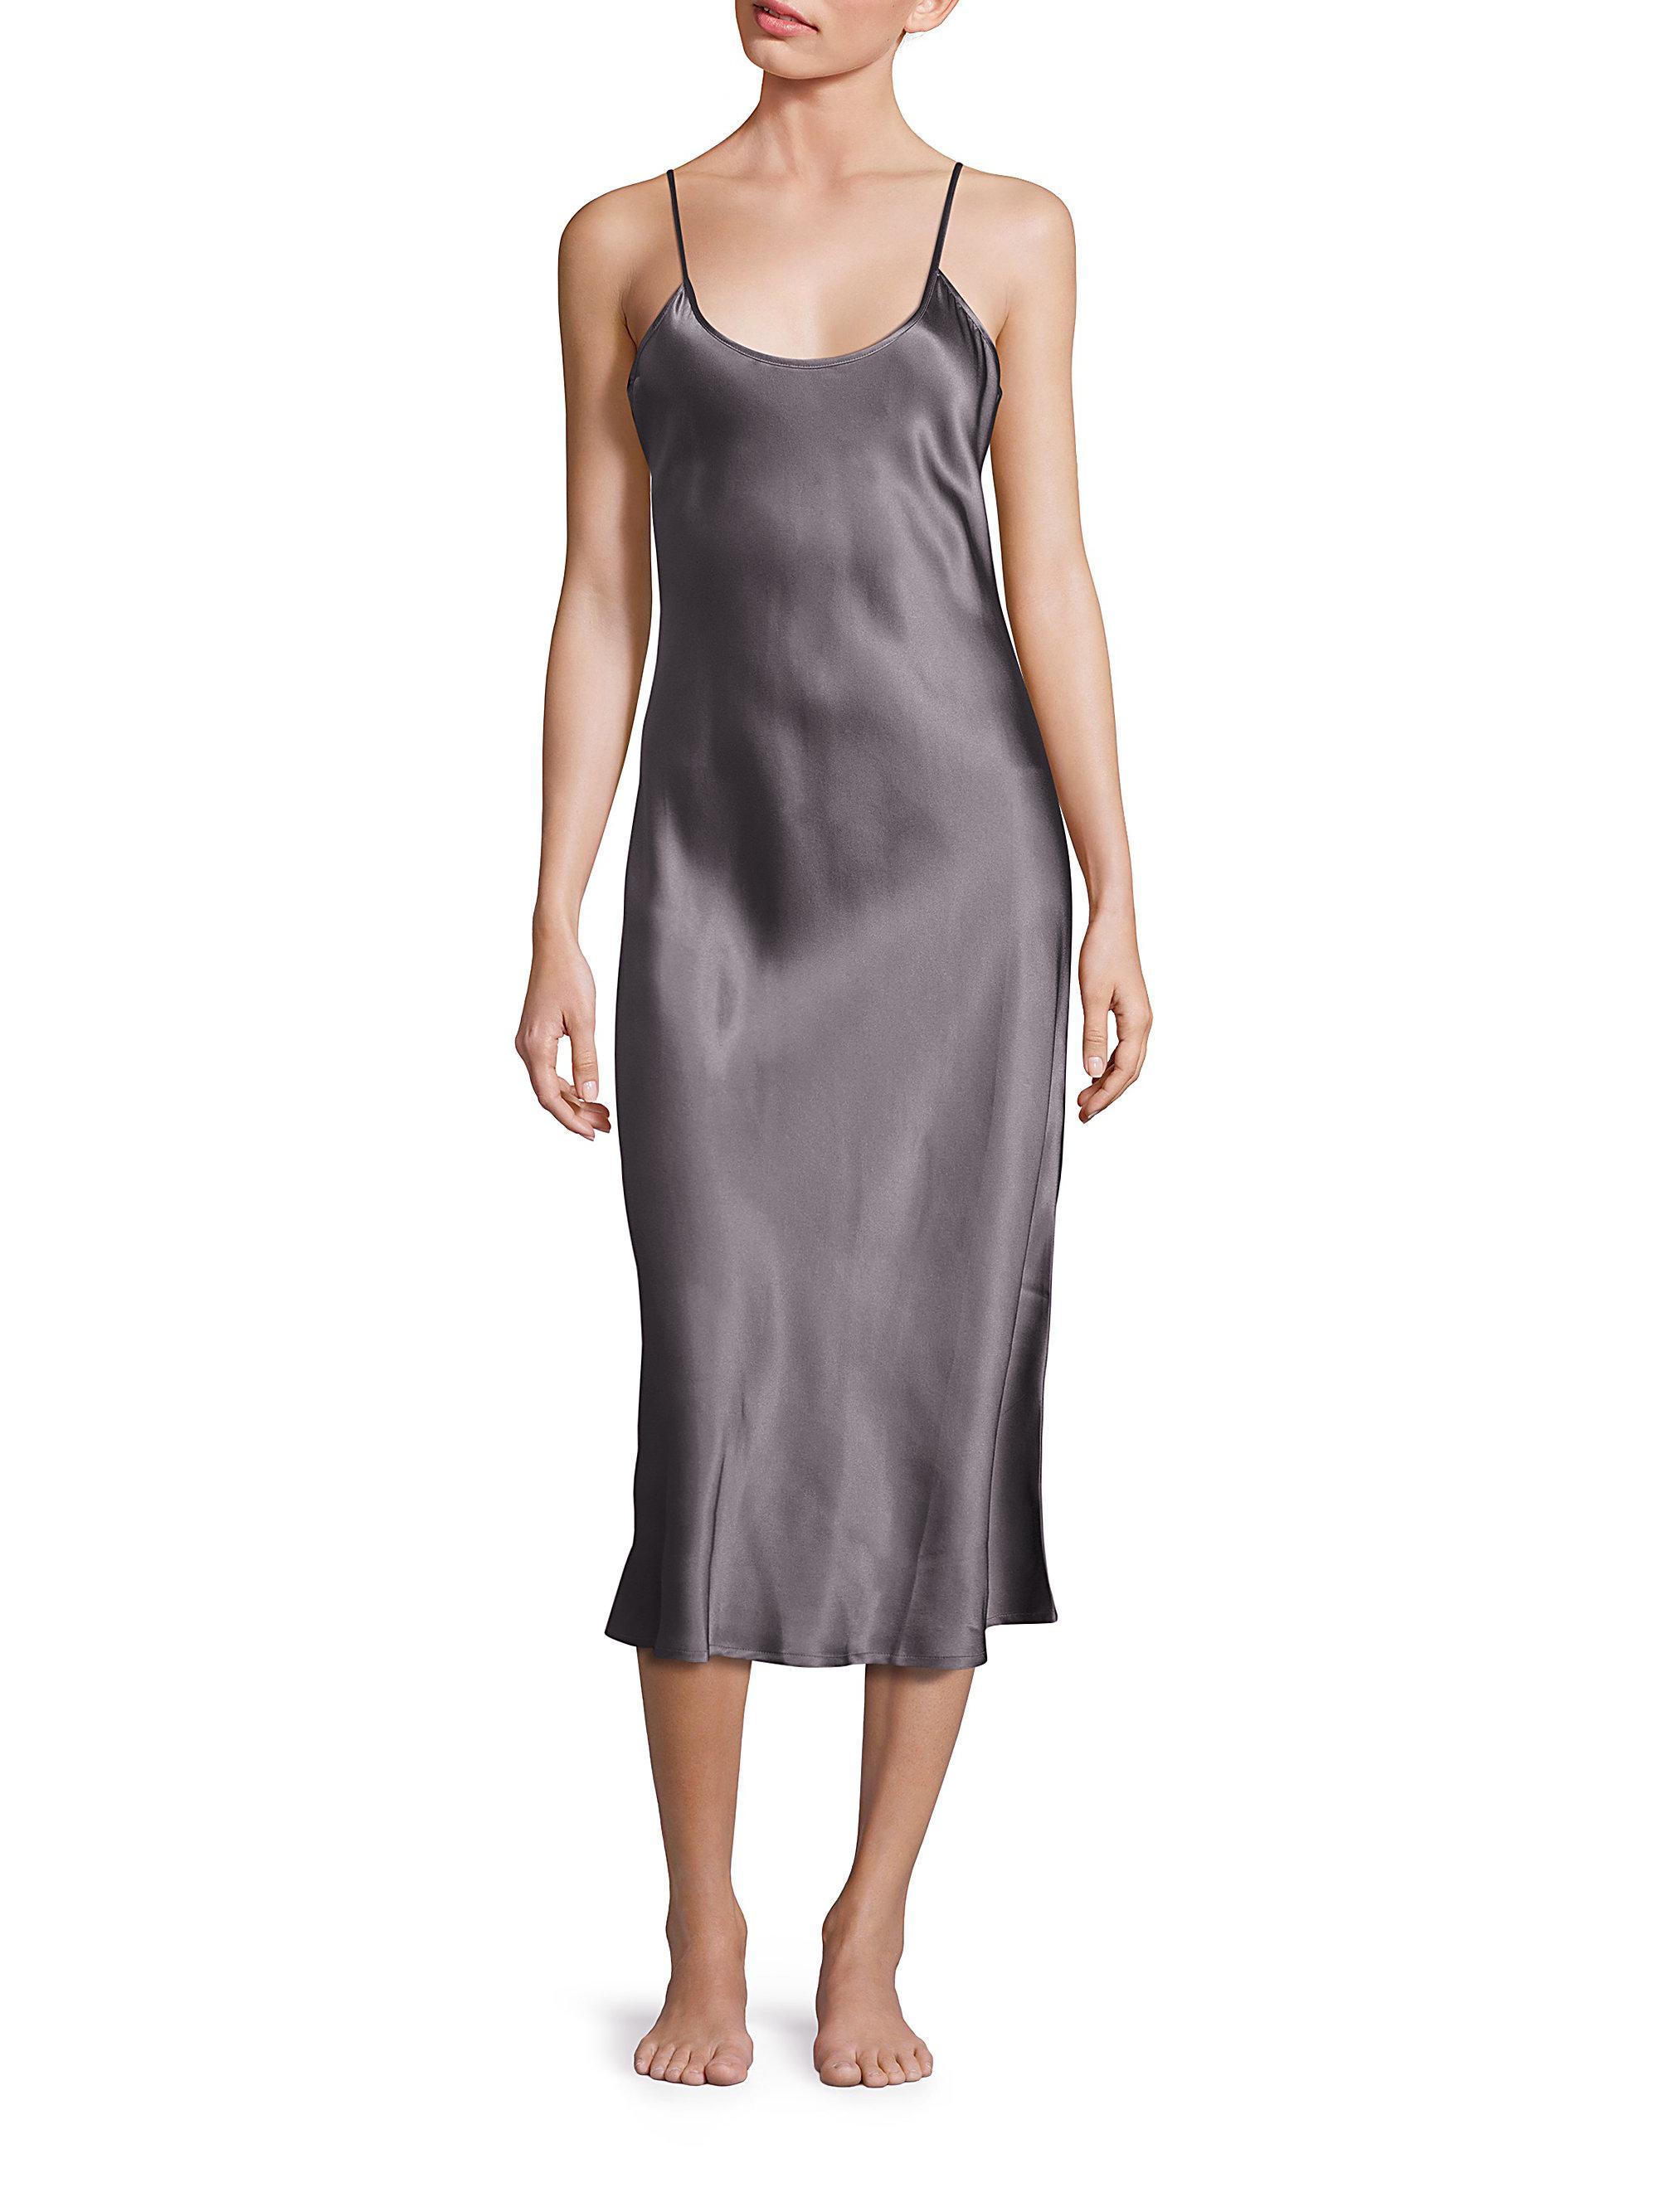 Footlocker For Sale Fashionable Sale Online Saks Fifth Avenue Satin ...